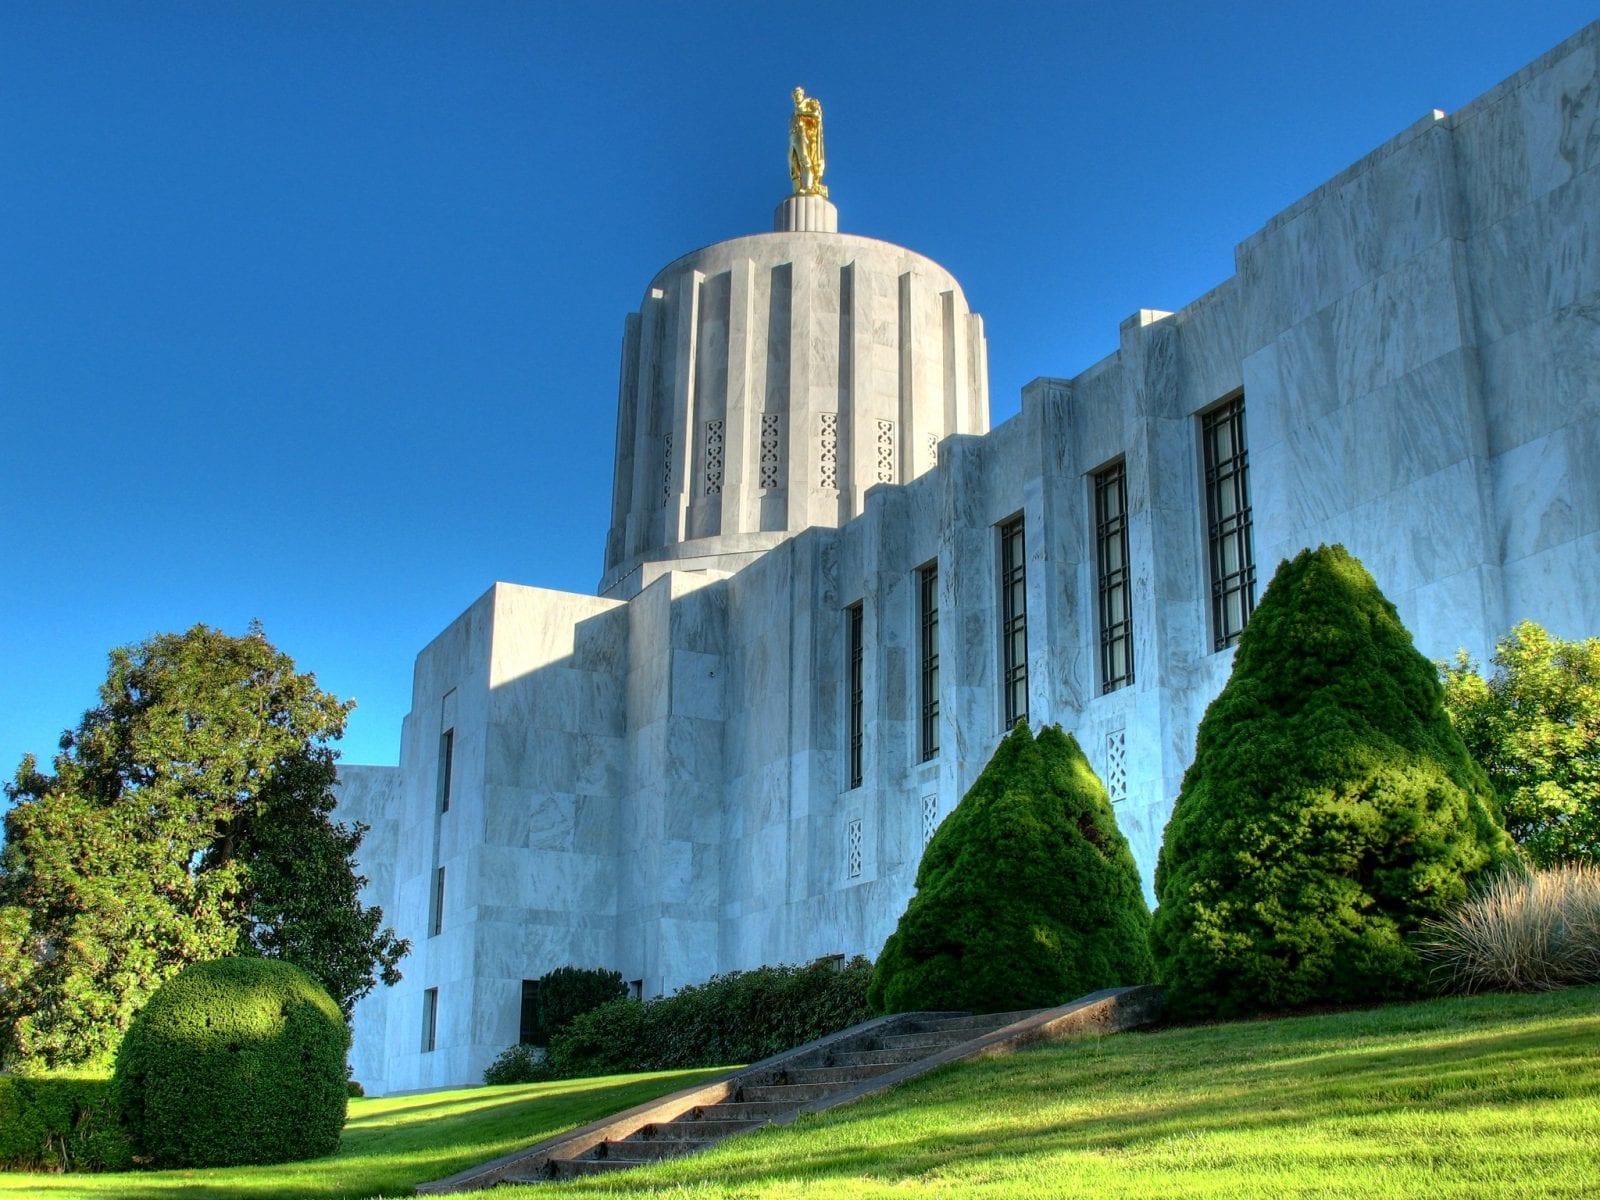 Oregon State Capitol building in Salem